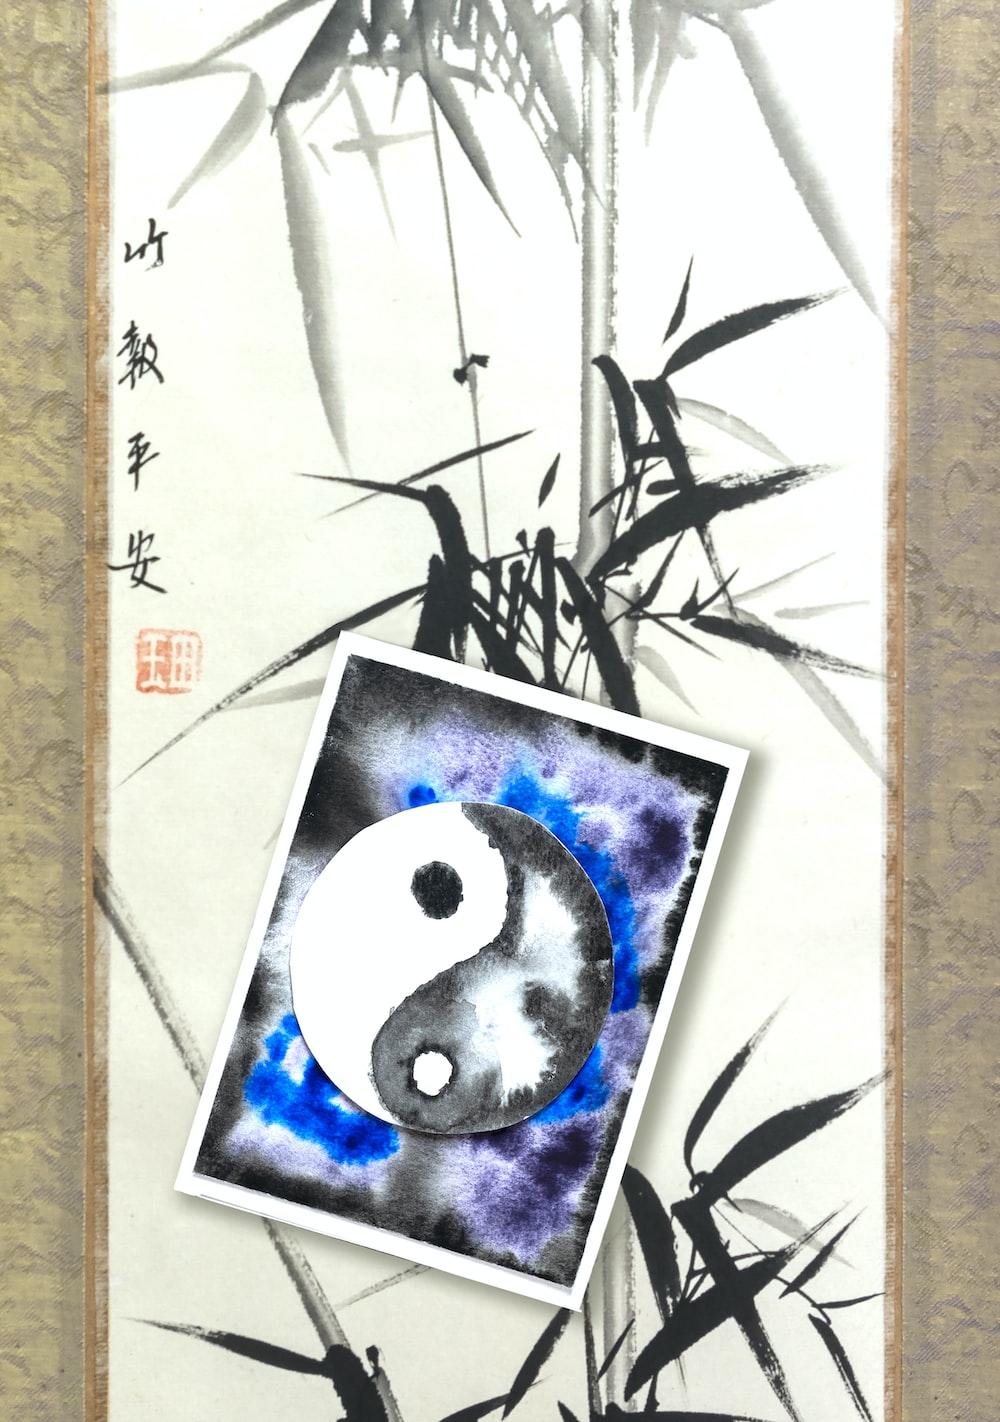 black and white panda illustration